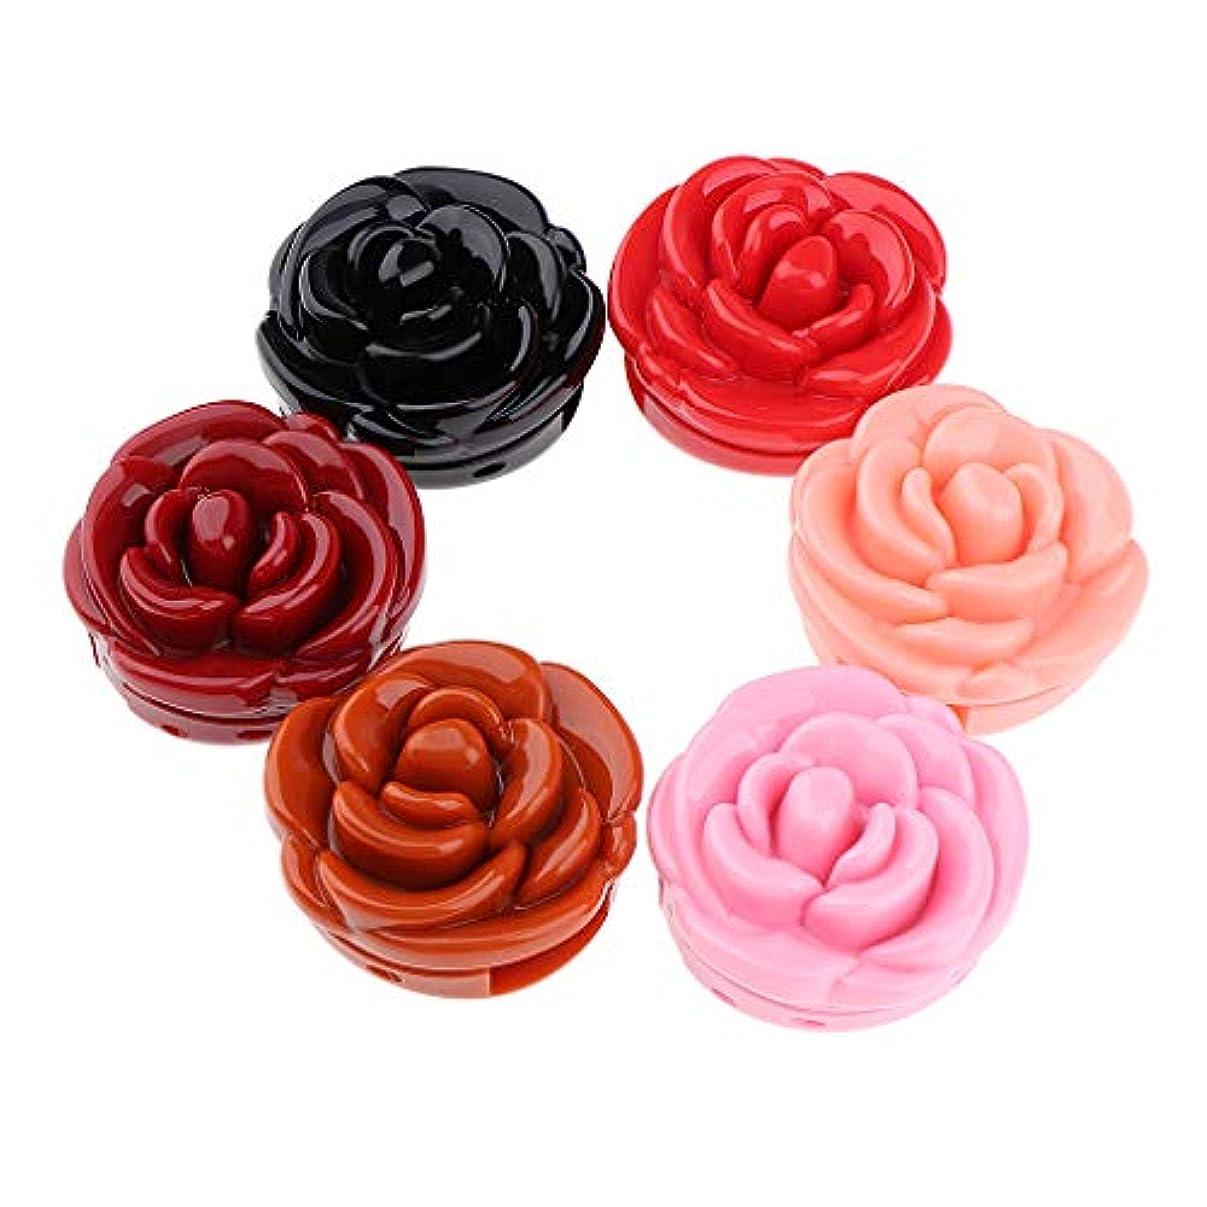 T TOOYFUL 口紅セット 6色セット リップクリーム 防水 美容 化粧品 メイクアップツール